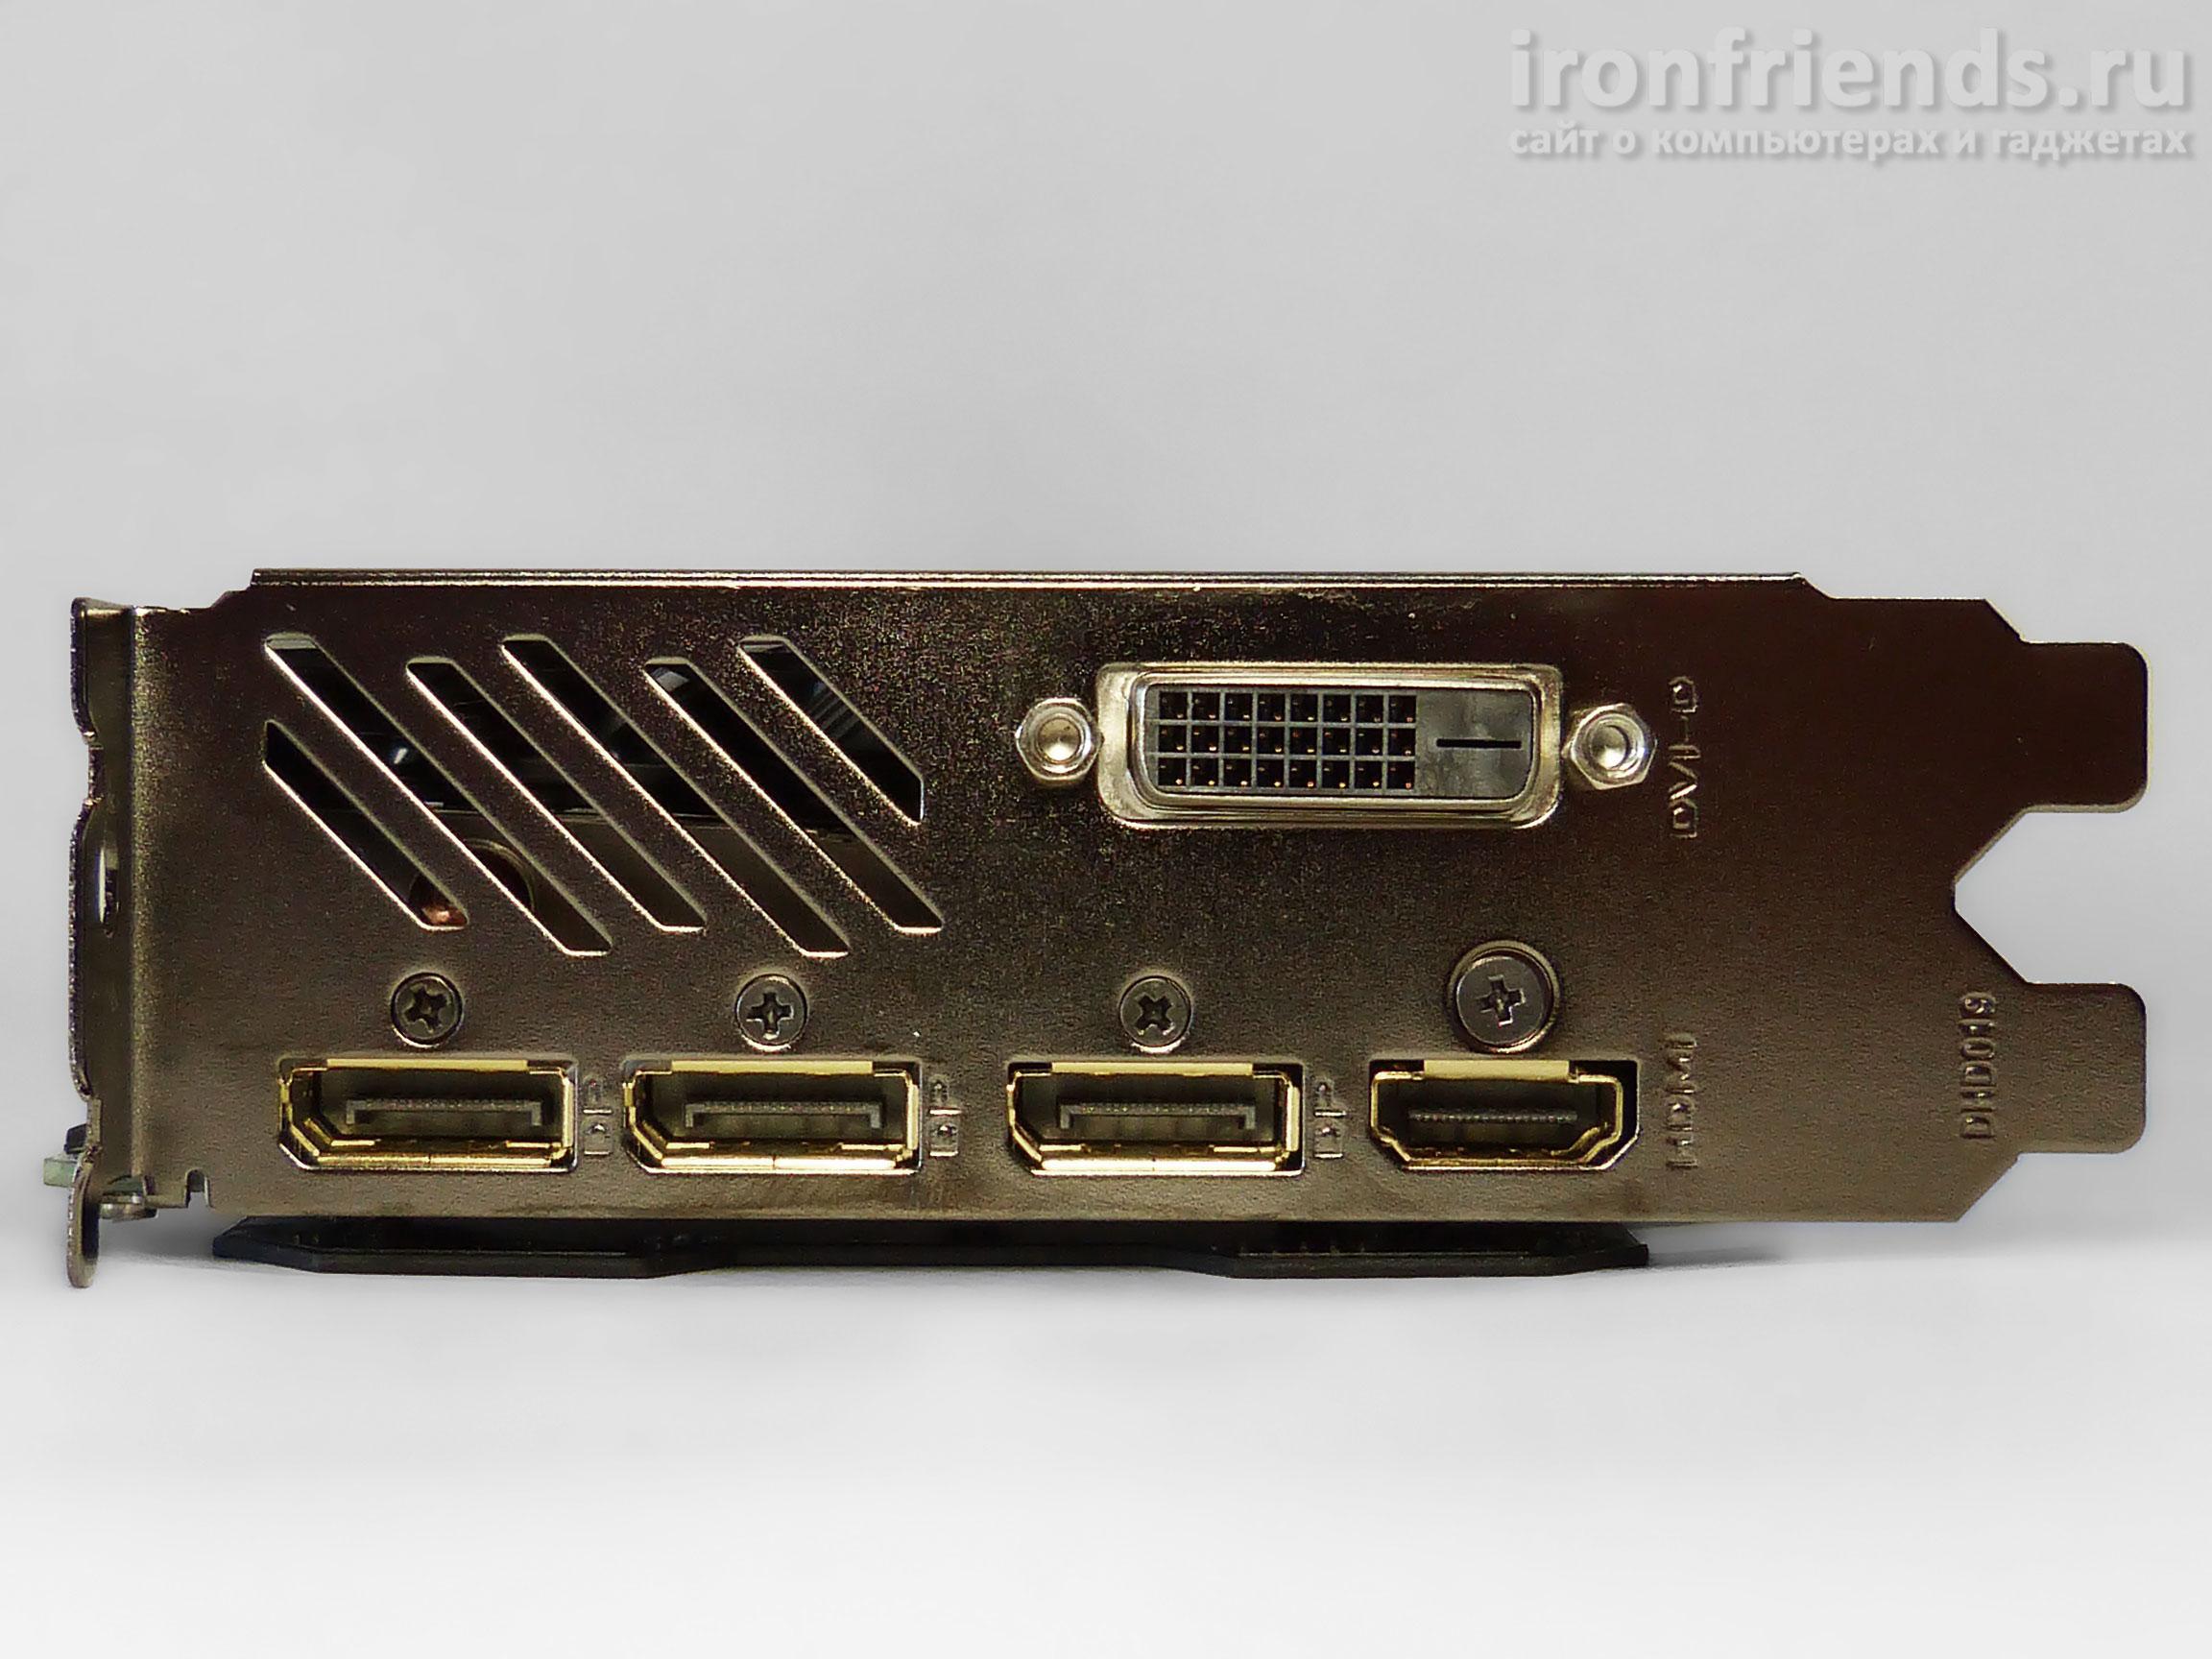 Разъемы Gigabyte GTX 1070 Ti Gaming 8G